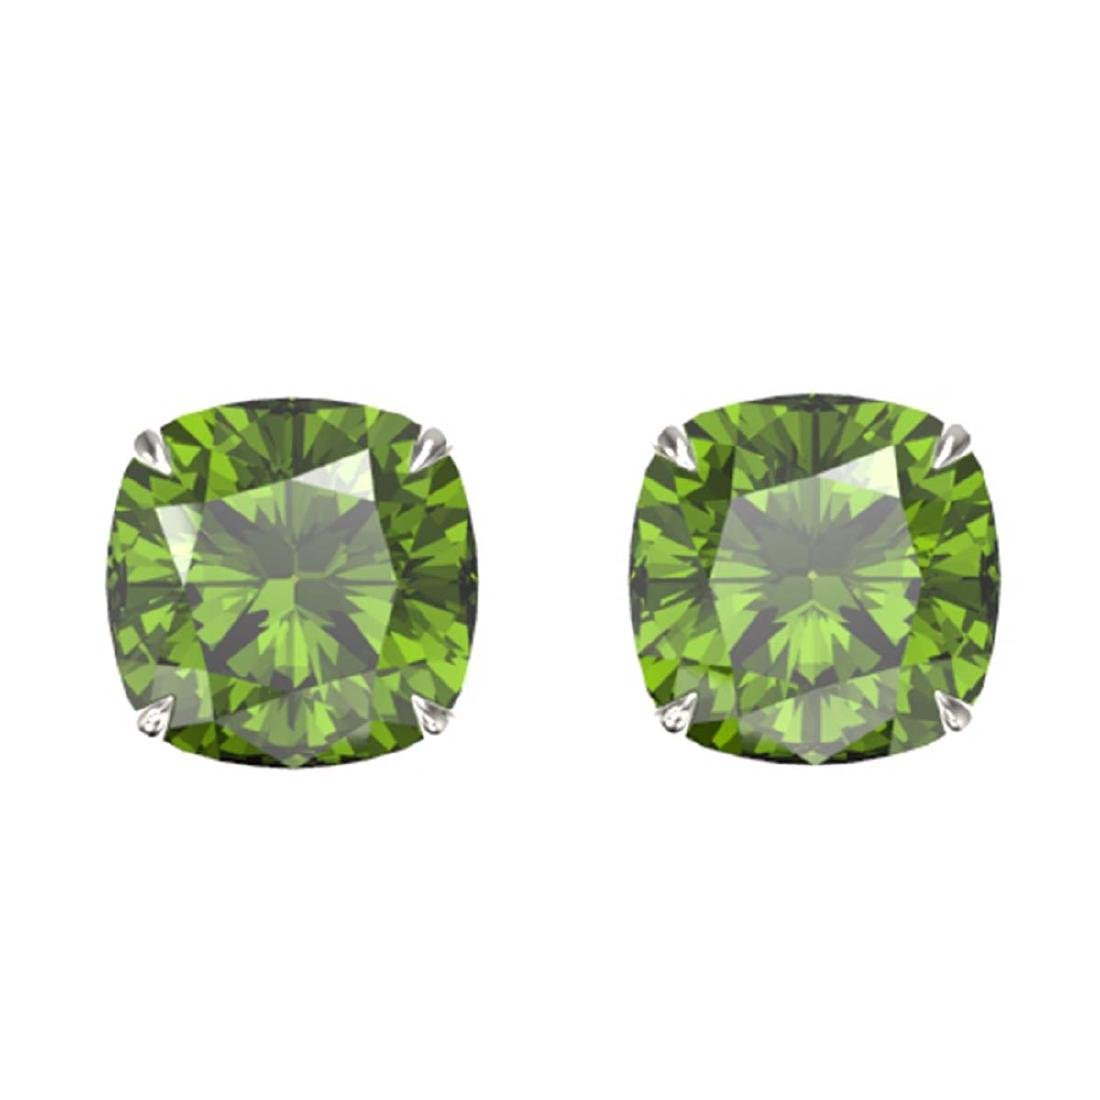 12 ctw Cushion Green Tourmaline Stud Earrings 18K White